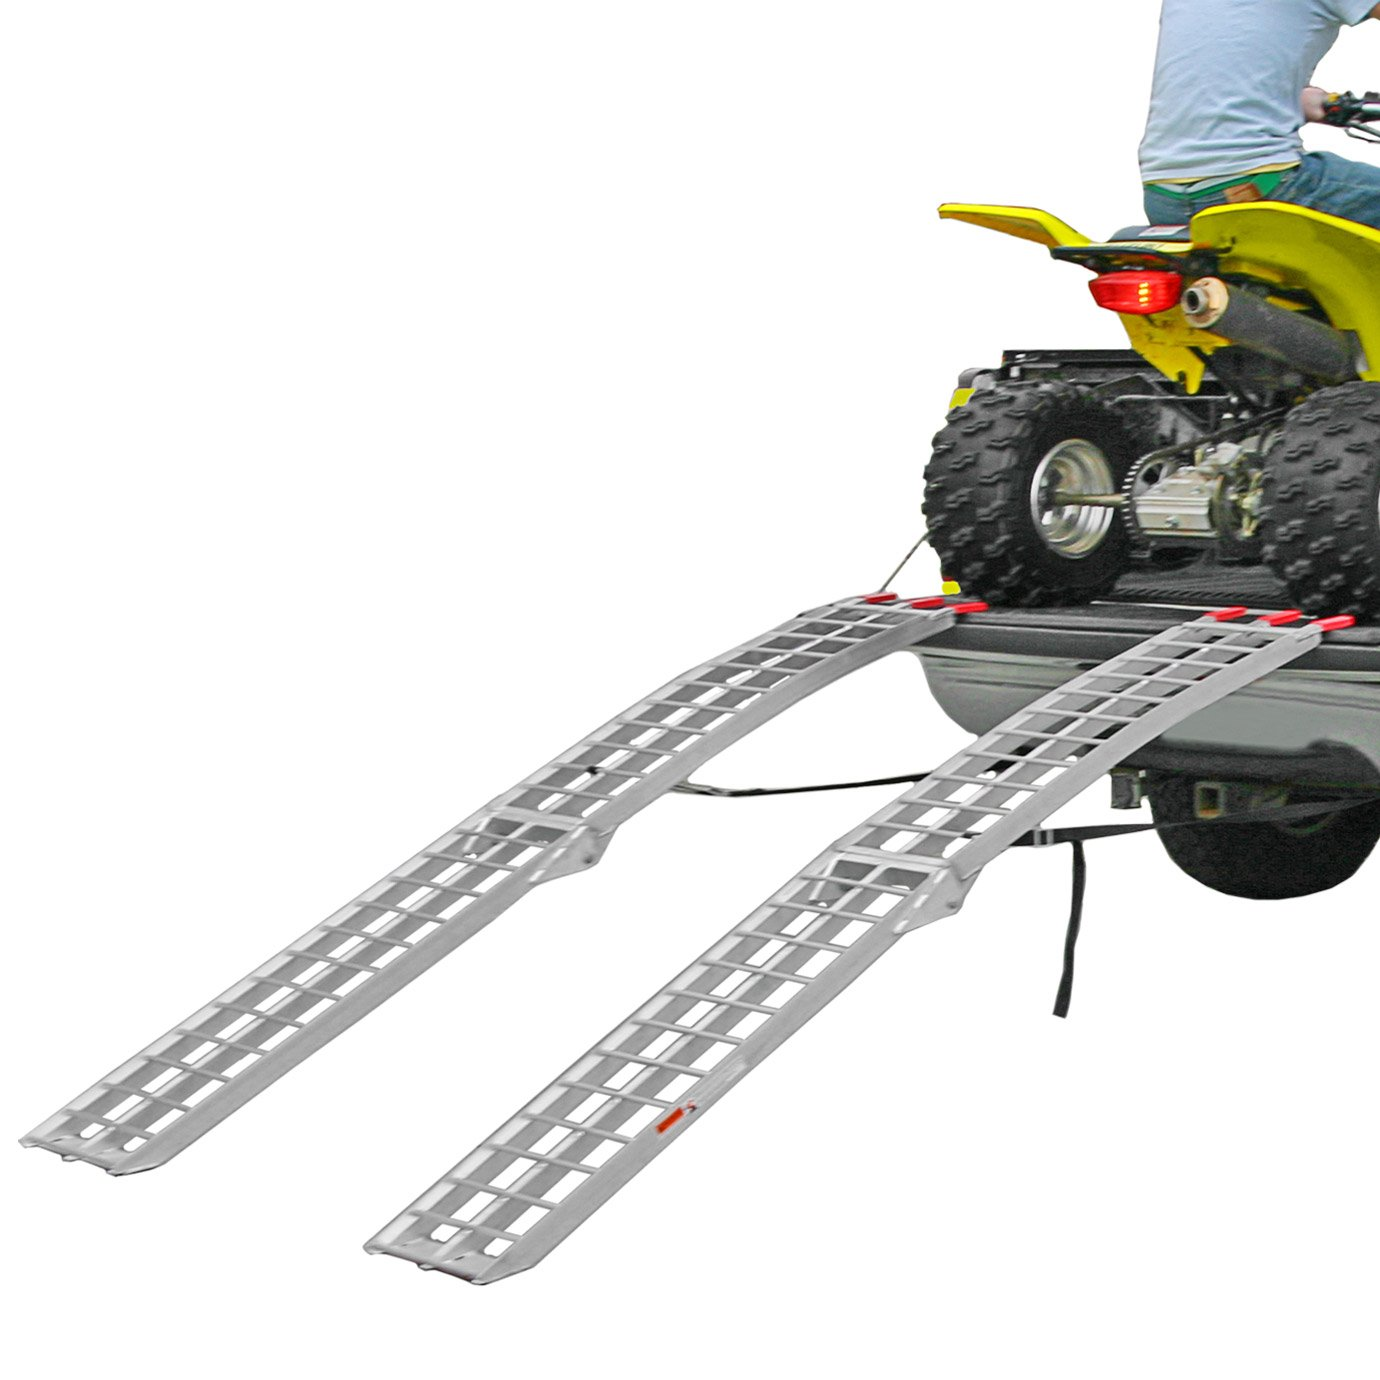 Black Widow AFL-9012-2 Dual Runner ATV Ramp - Finger-Style Lip Rung Surface, 2 Pack